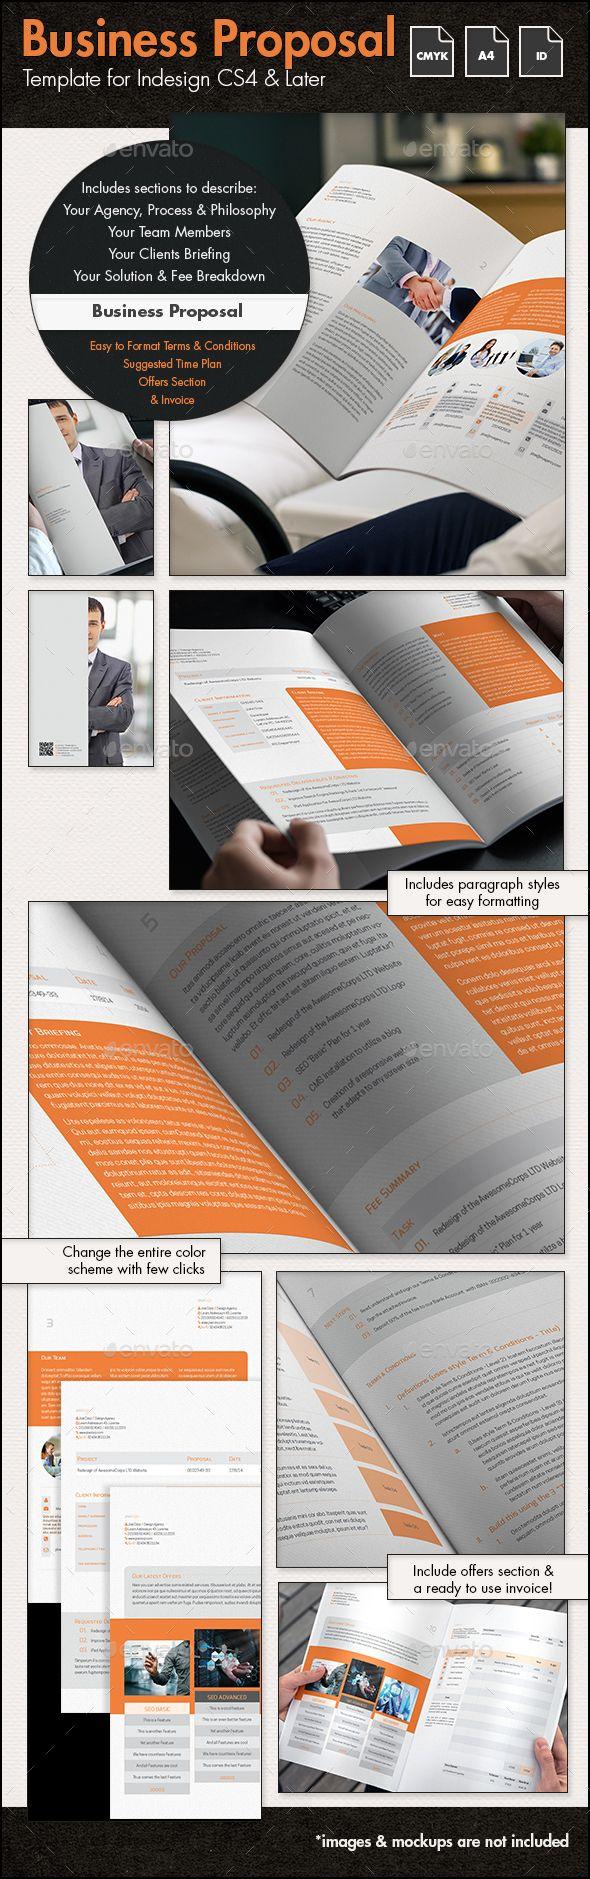 Business Proposal Template A4 Portrait Business